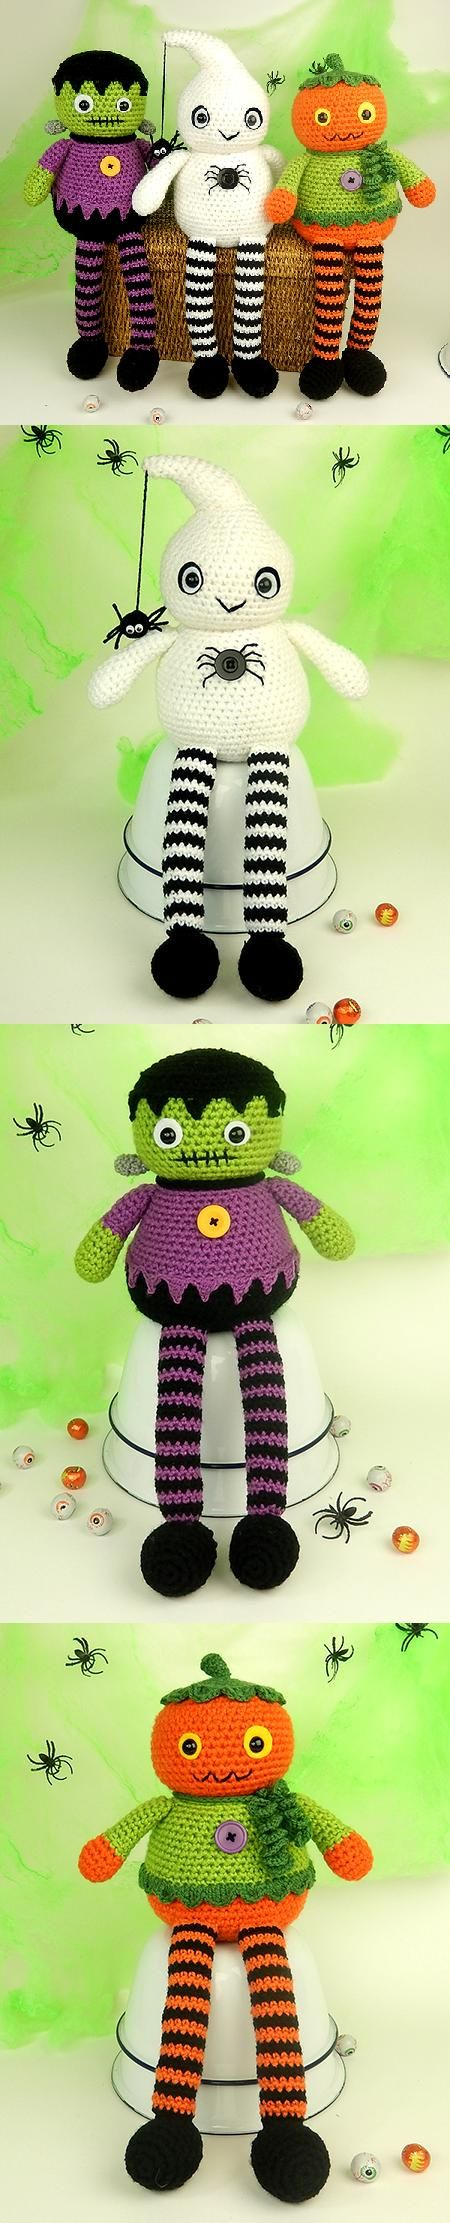 Halloween Longlegs Dolls amigurumi pattern by Janine Holmes at Moji-Moji Design